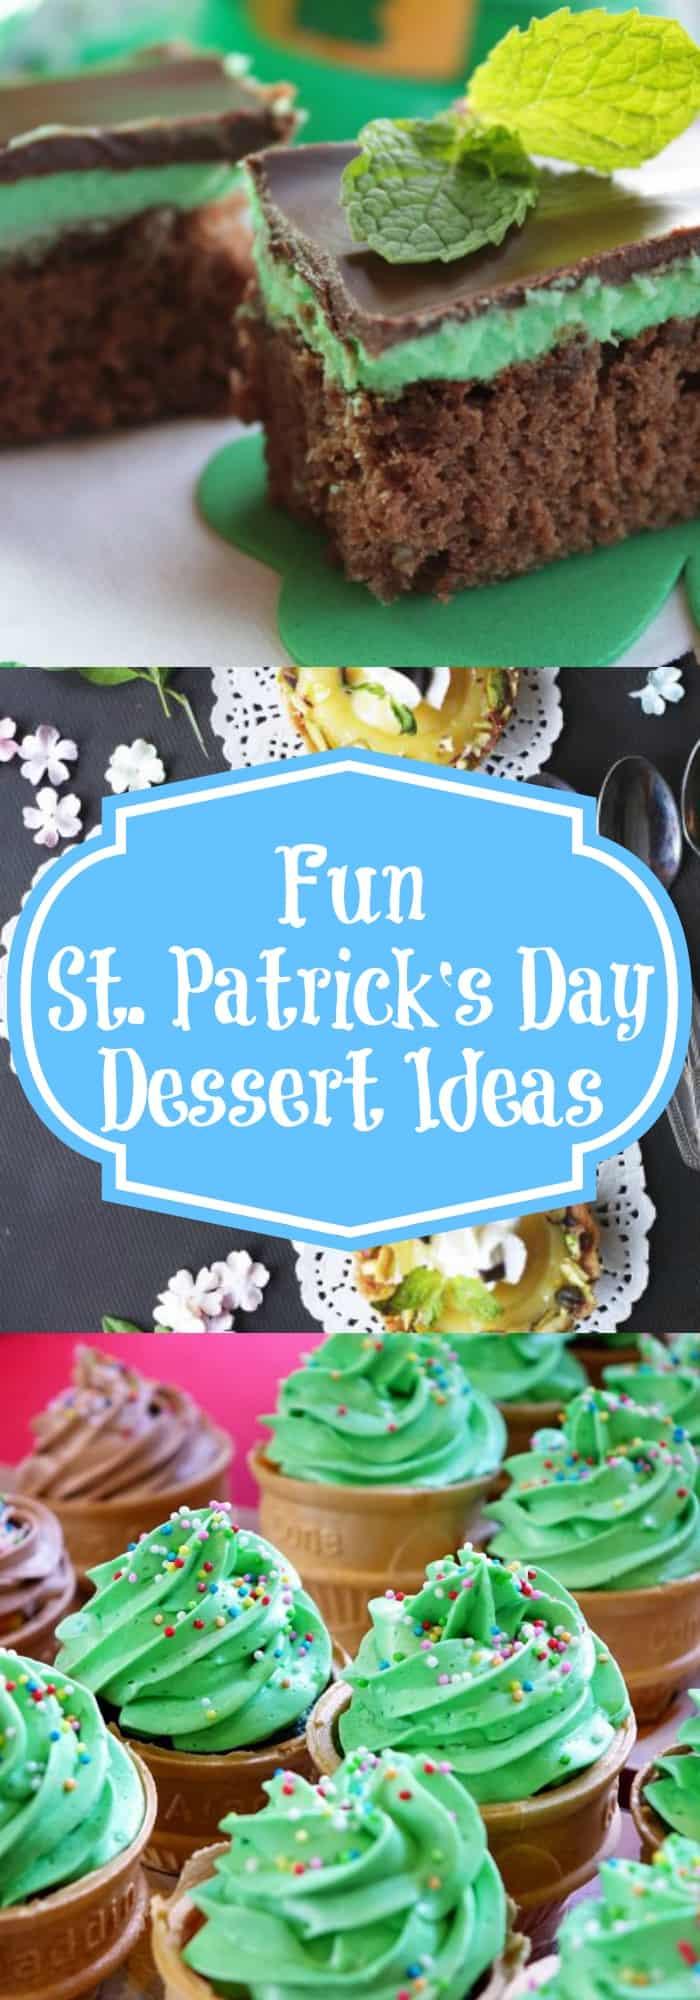 Fun St. Patrick's Day Dessert Ideas